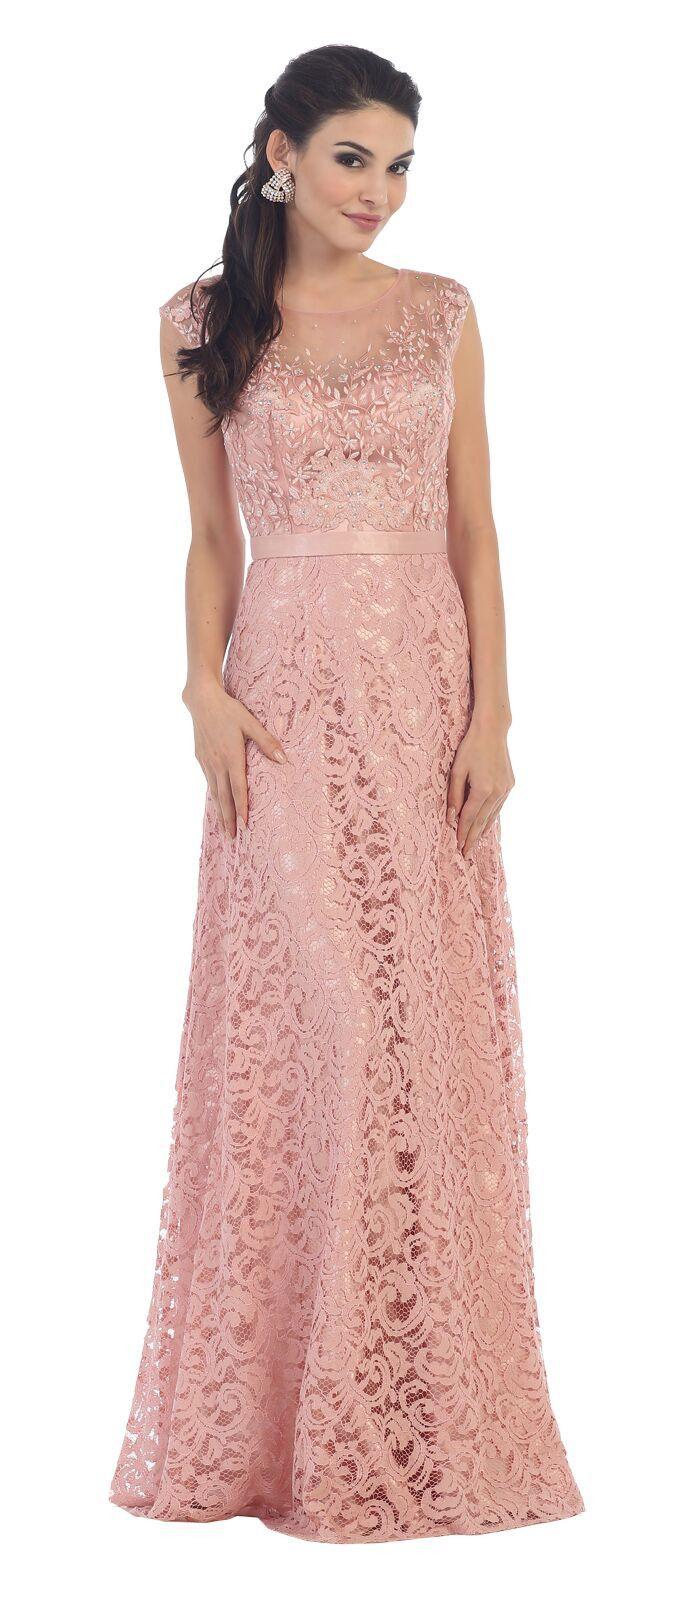 786 best vestidos de festa images on Pinterest | Ball gown, Cute ...